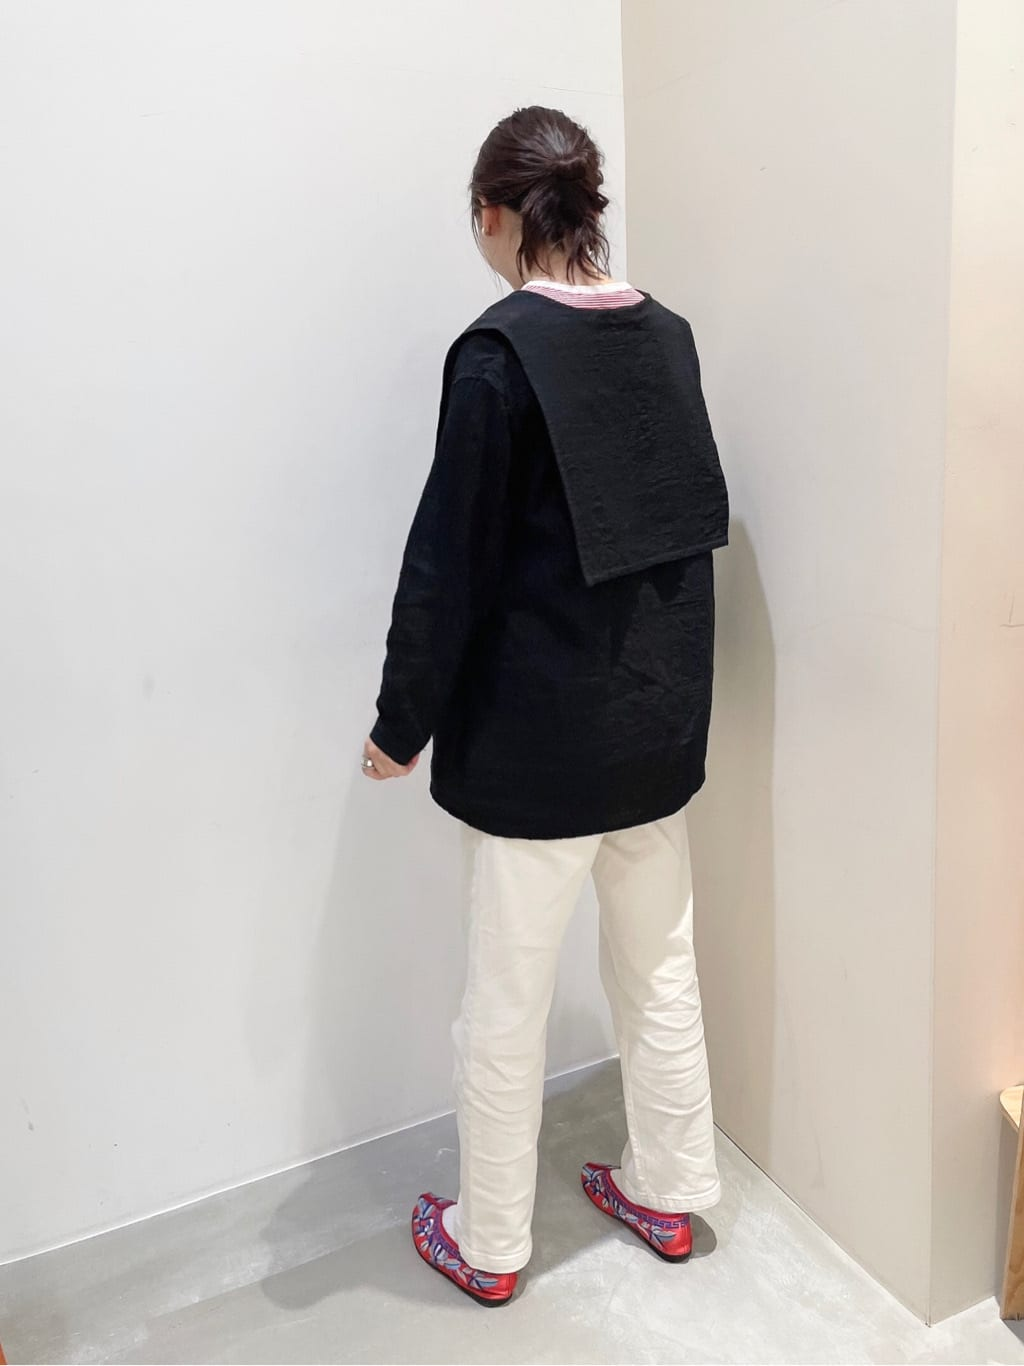 bulle de savon 阪急西宮ガーデンズ 身長:166cm 2021.08.22